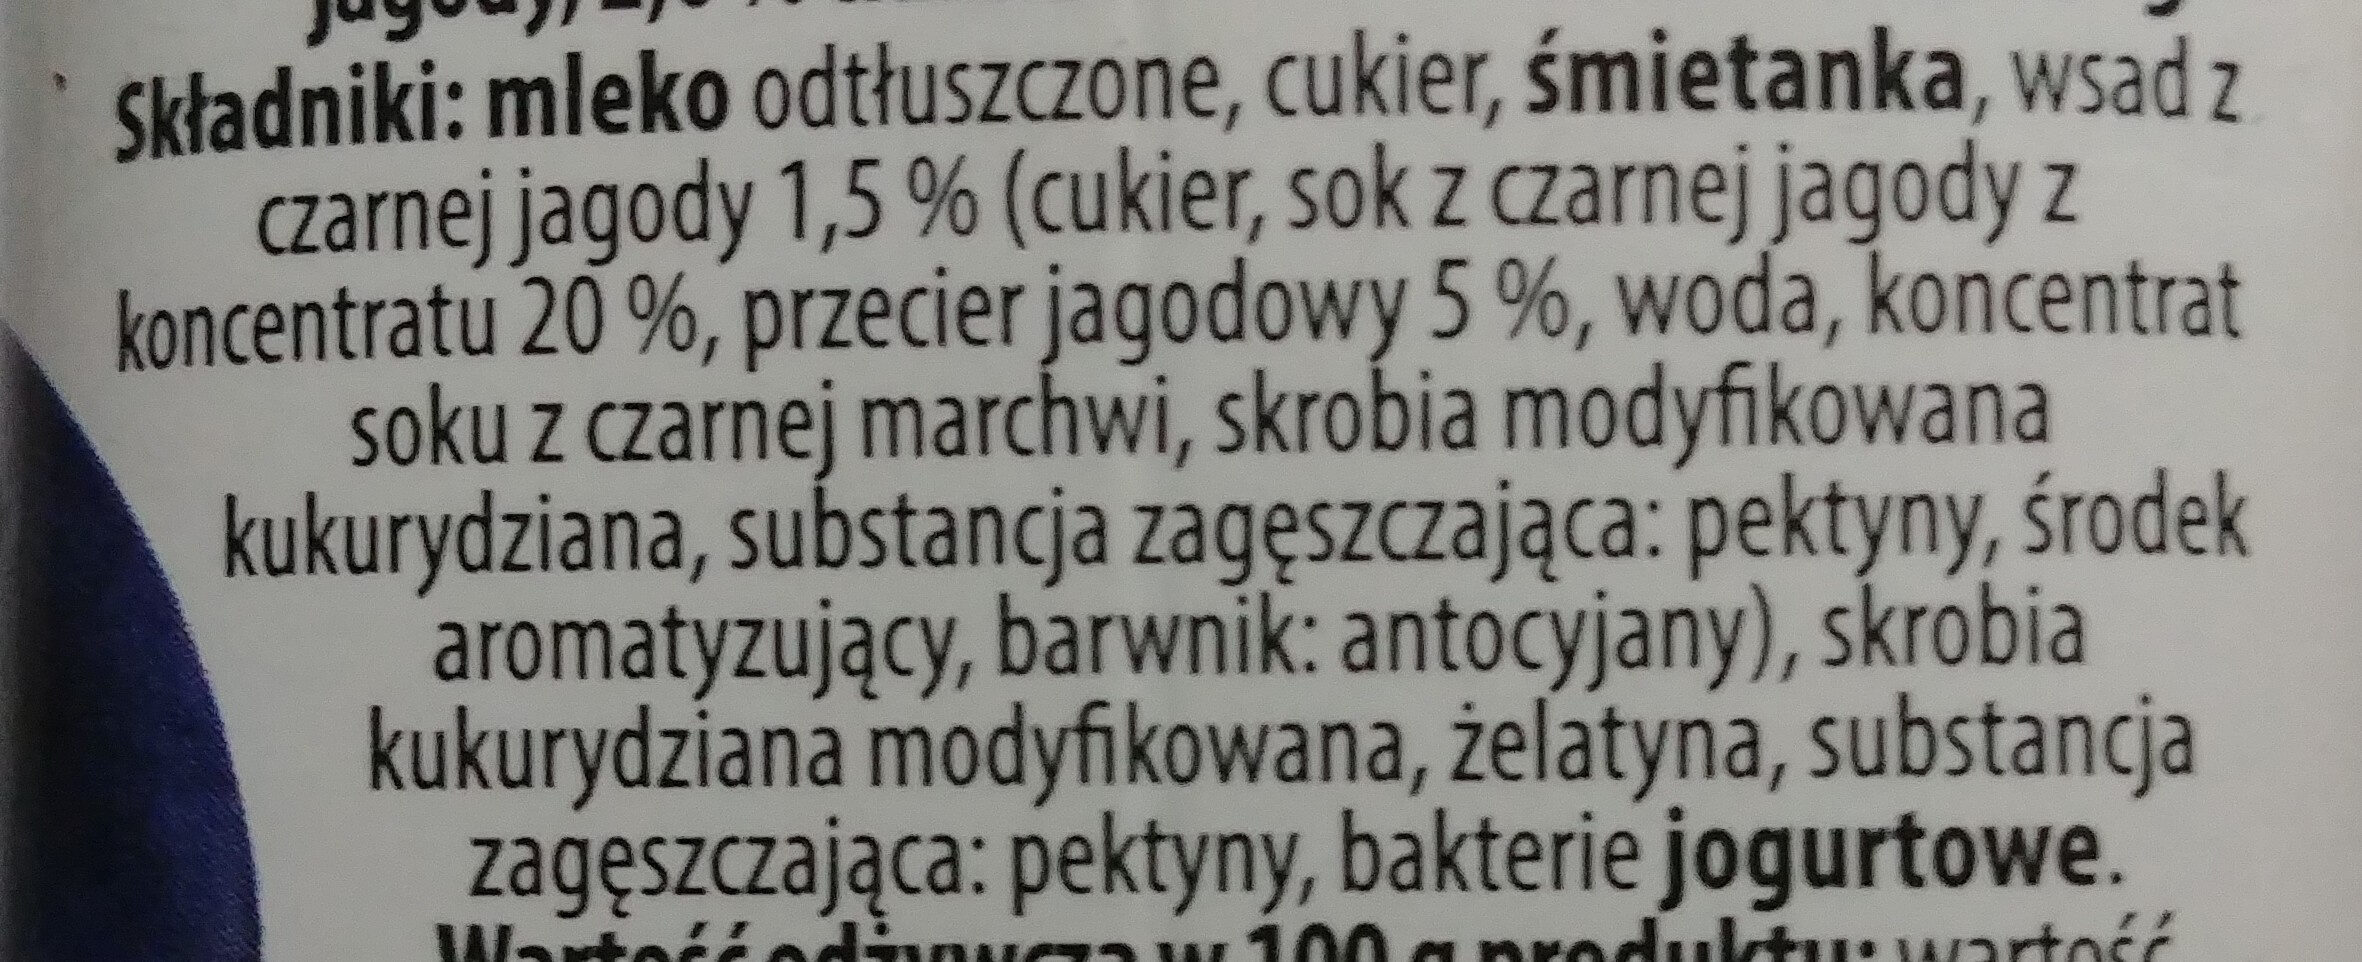 Jogurt pitny o smaku czarnej jagody 2% - Składniki - pl